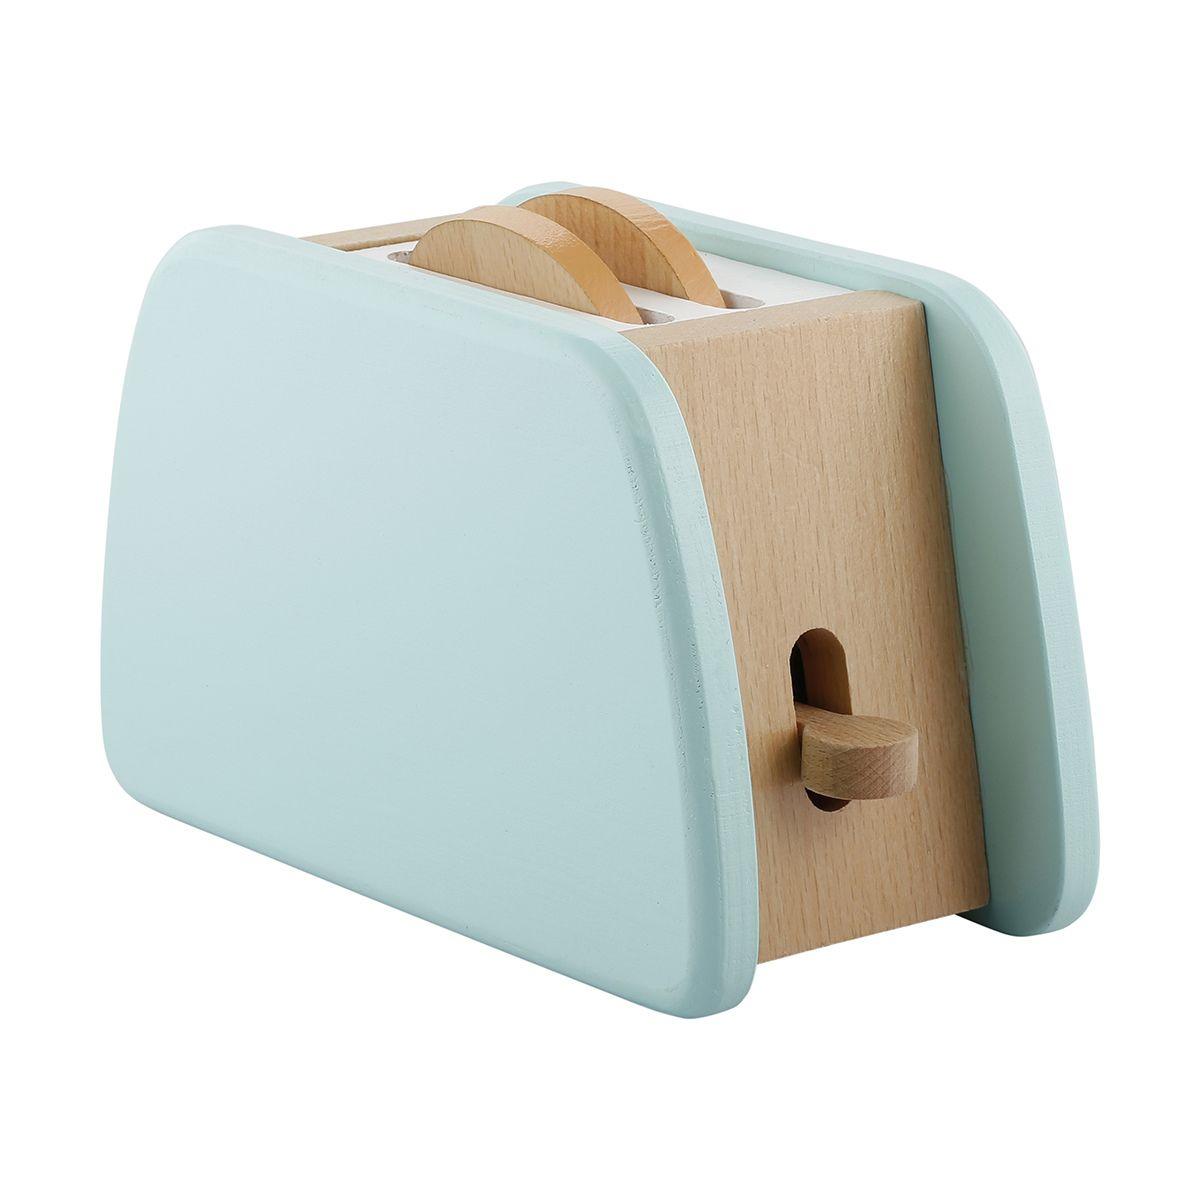 Wooden Toy Toaster | Kmart | Kmart wishlist | Pinterest | Wooden ...